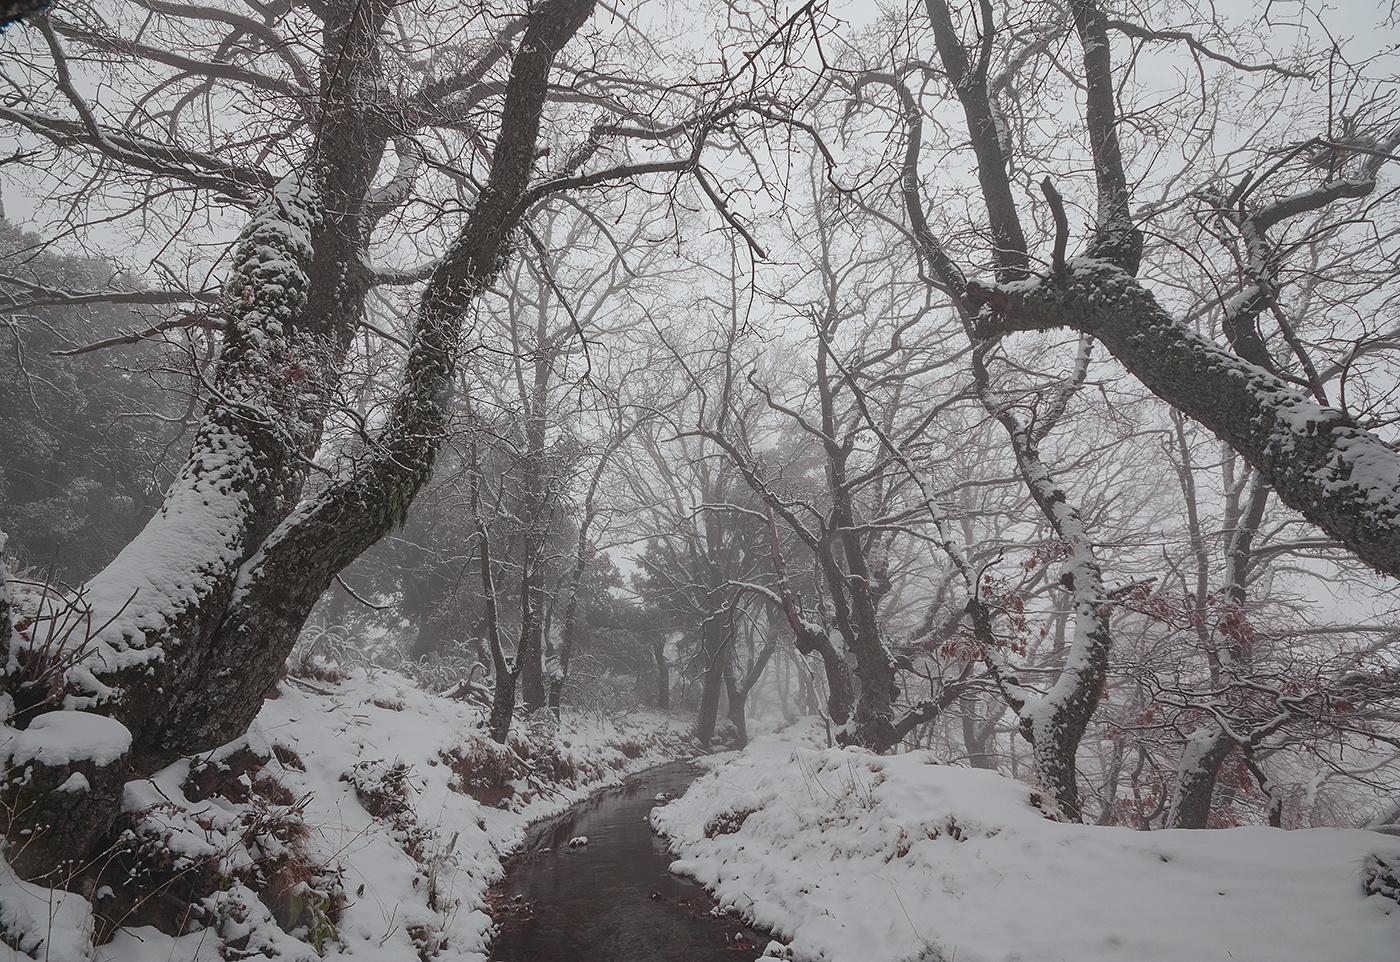 Sierra Nevada - Waldeinsamkeit - Peter Manschot Al Andalus Photo Tour, Landscape photography photos prints workshops Andalusia Spain